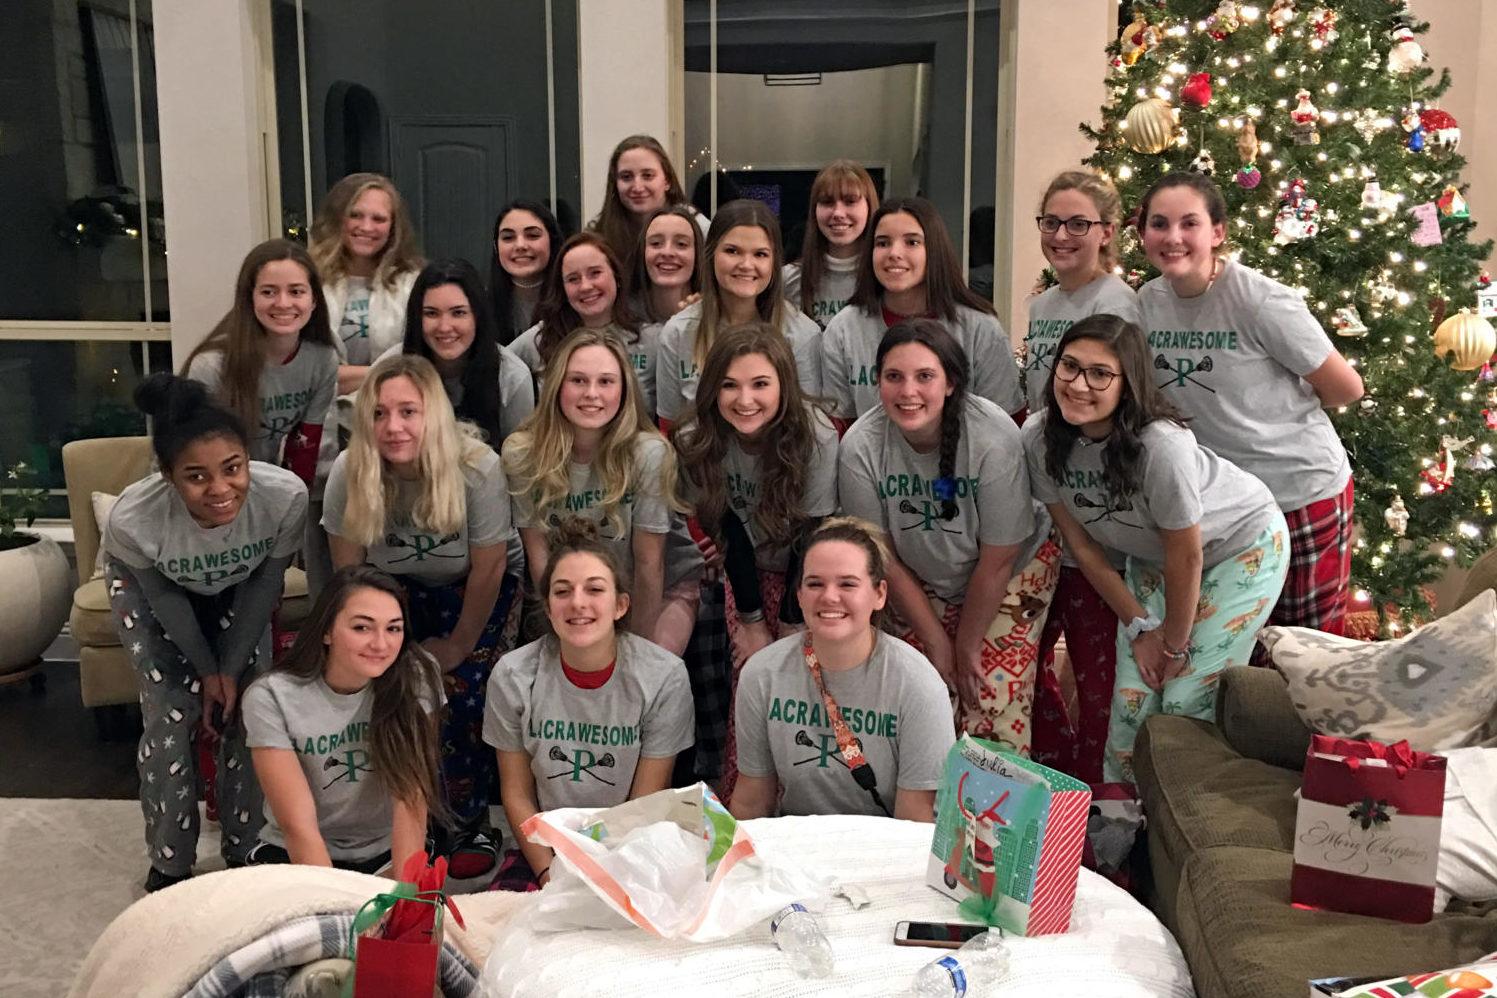 The girls' lacrosse team will volunteer for